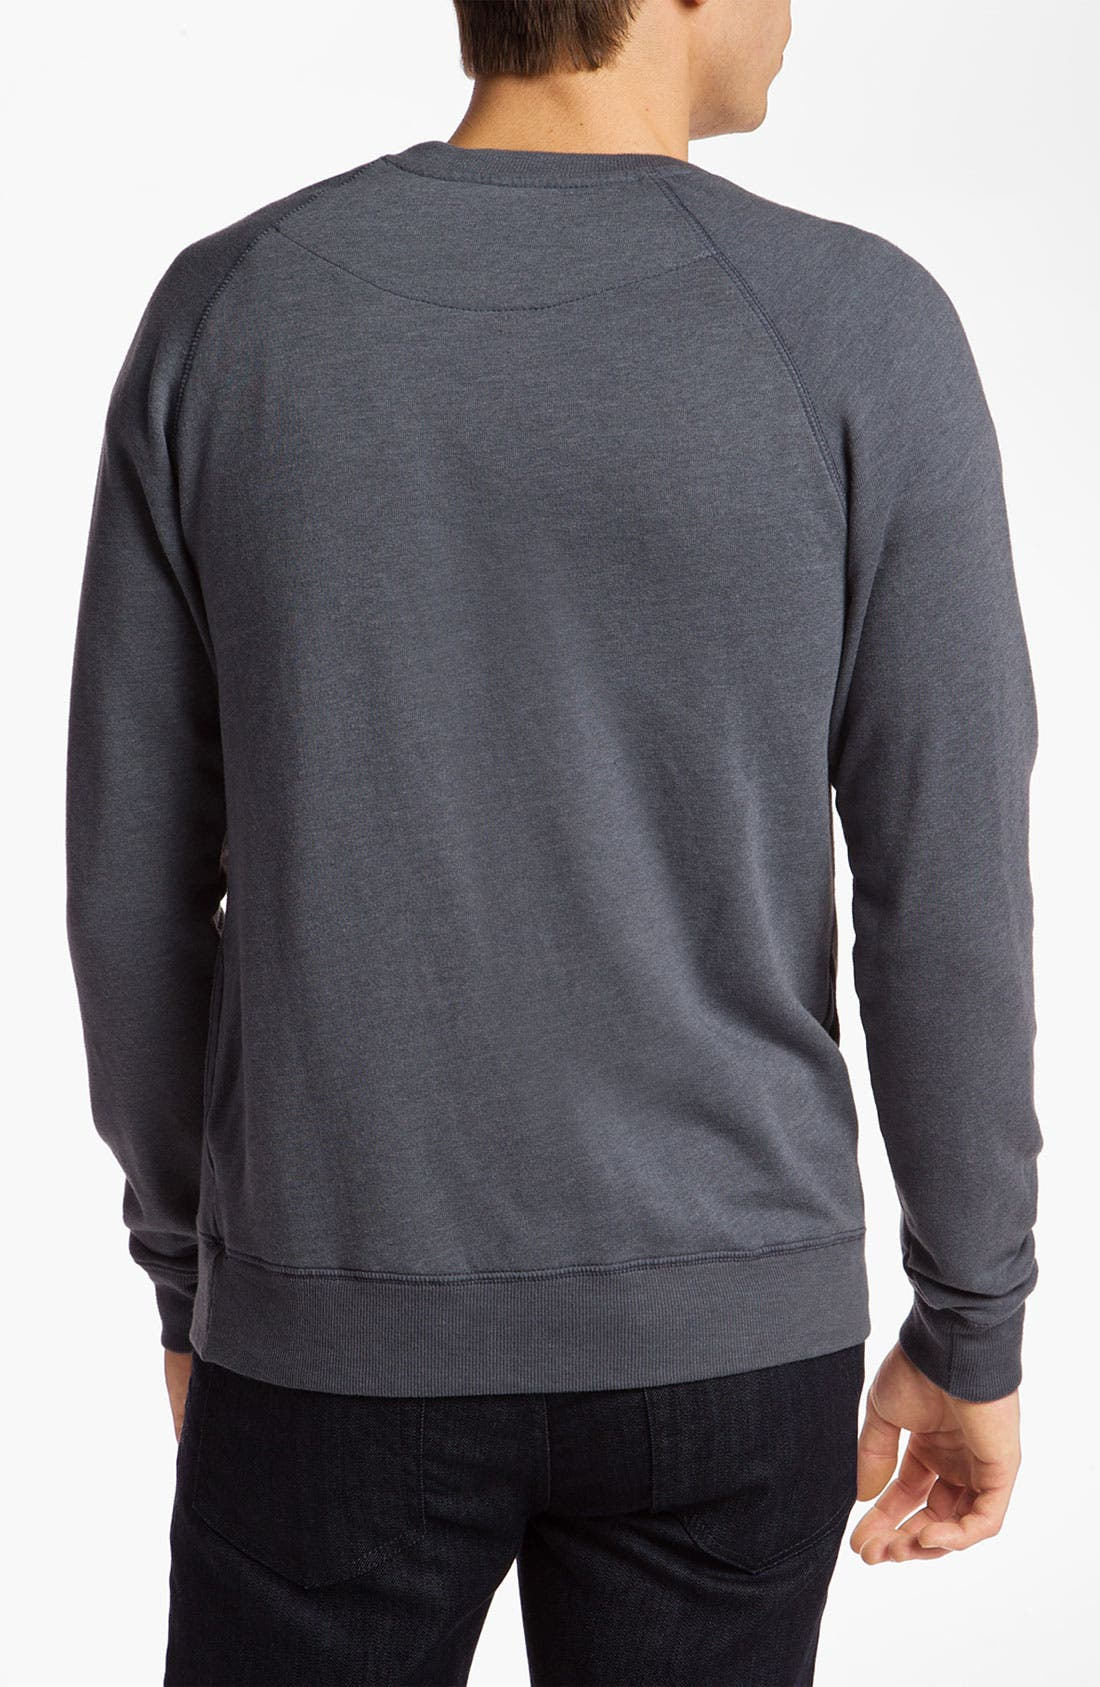 Alternate Image 2  - Topo Ranch 'Check' Crewneck Sweatshirt